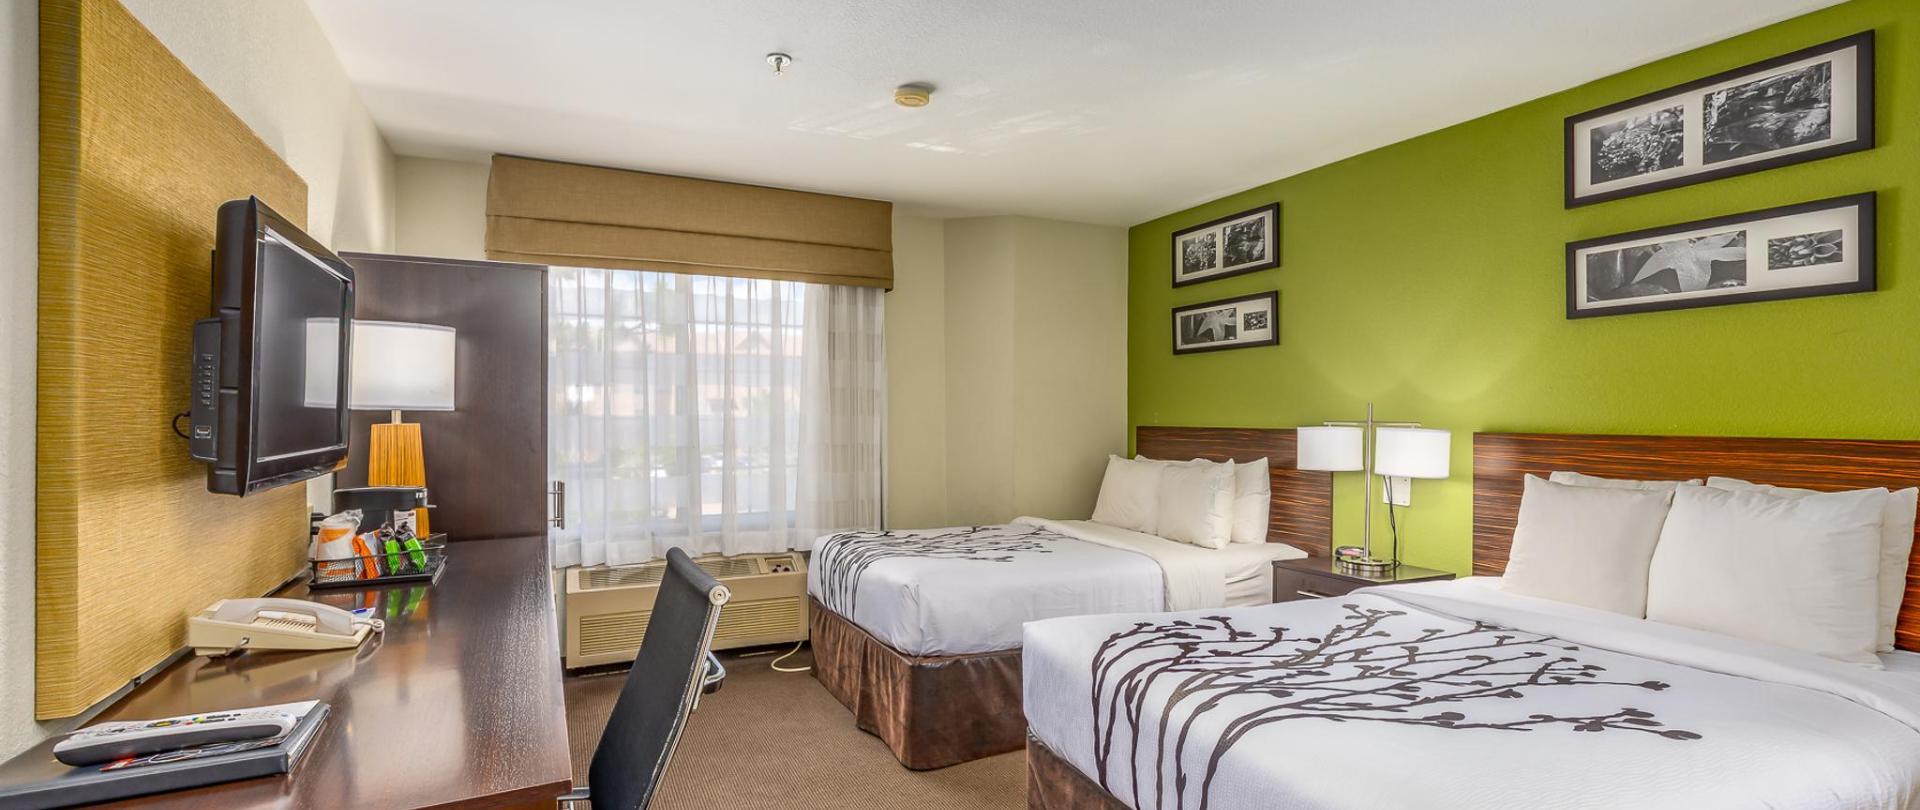 Room 240-1.jpg